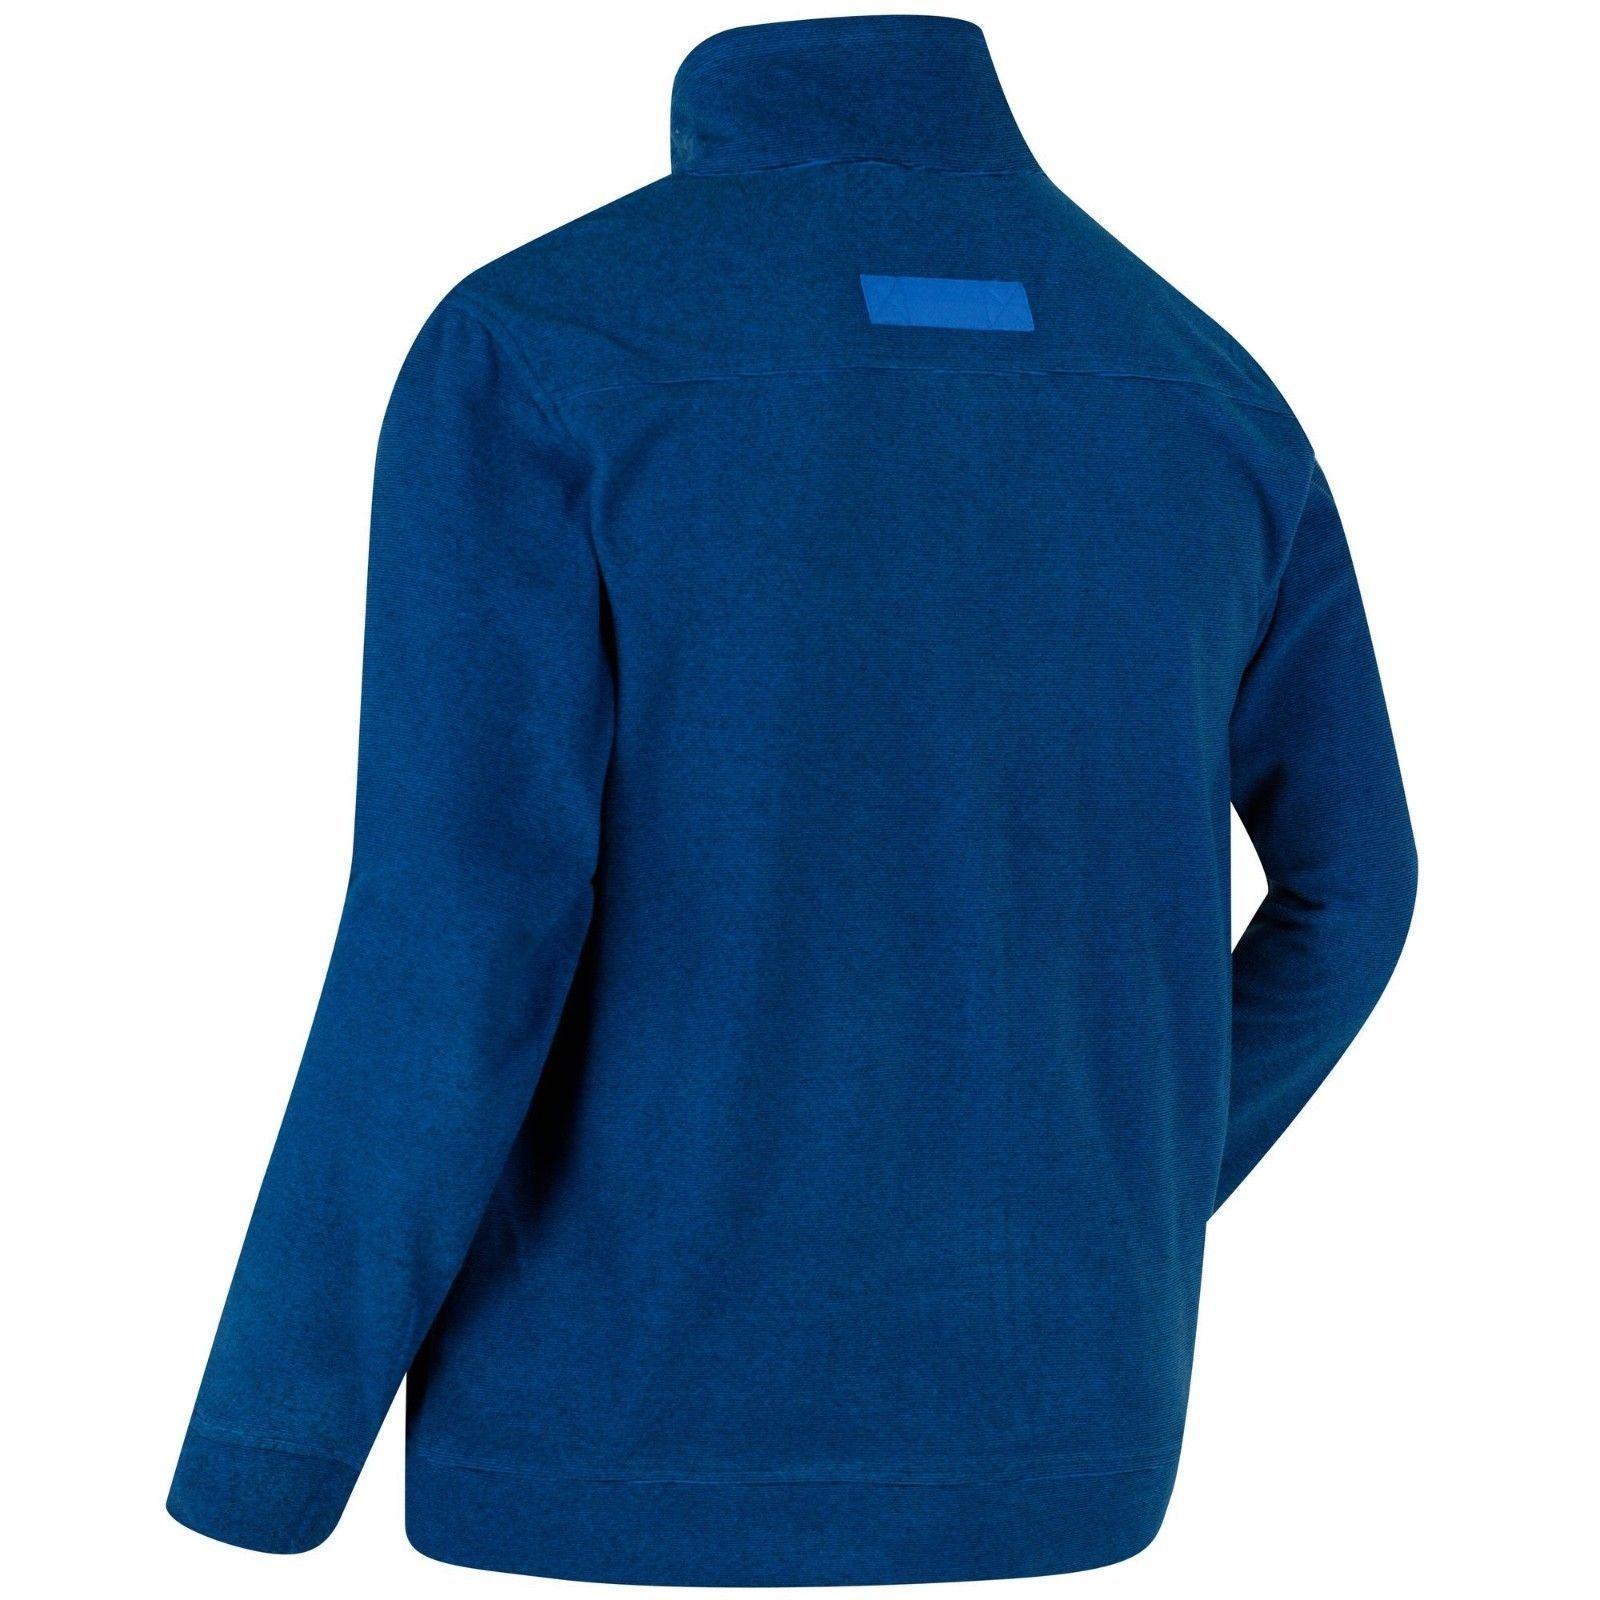 Regatta-Mens-Ultar-III-Full-Zip-Casual-Comfortable-Fleece-Jacket thumbnail 7